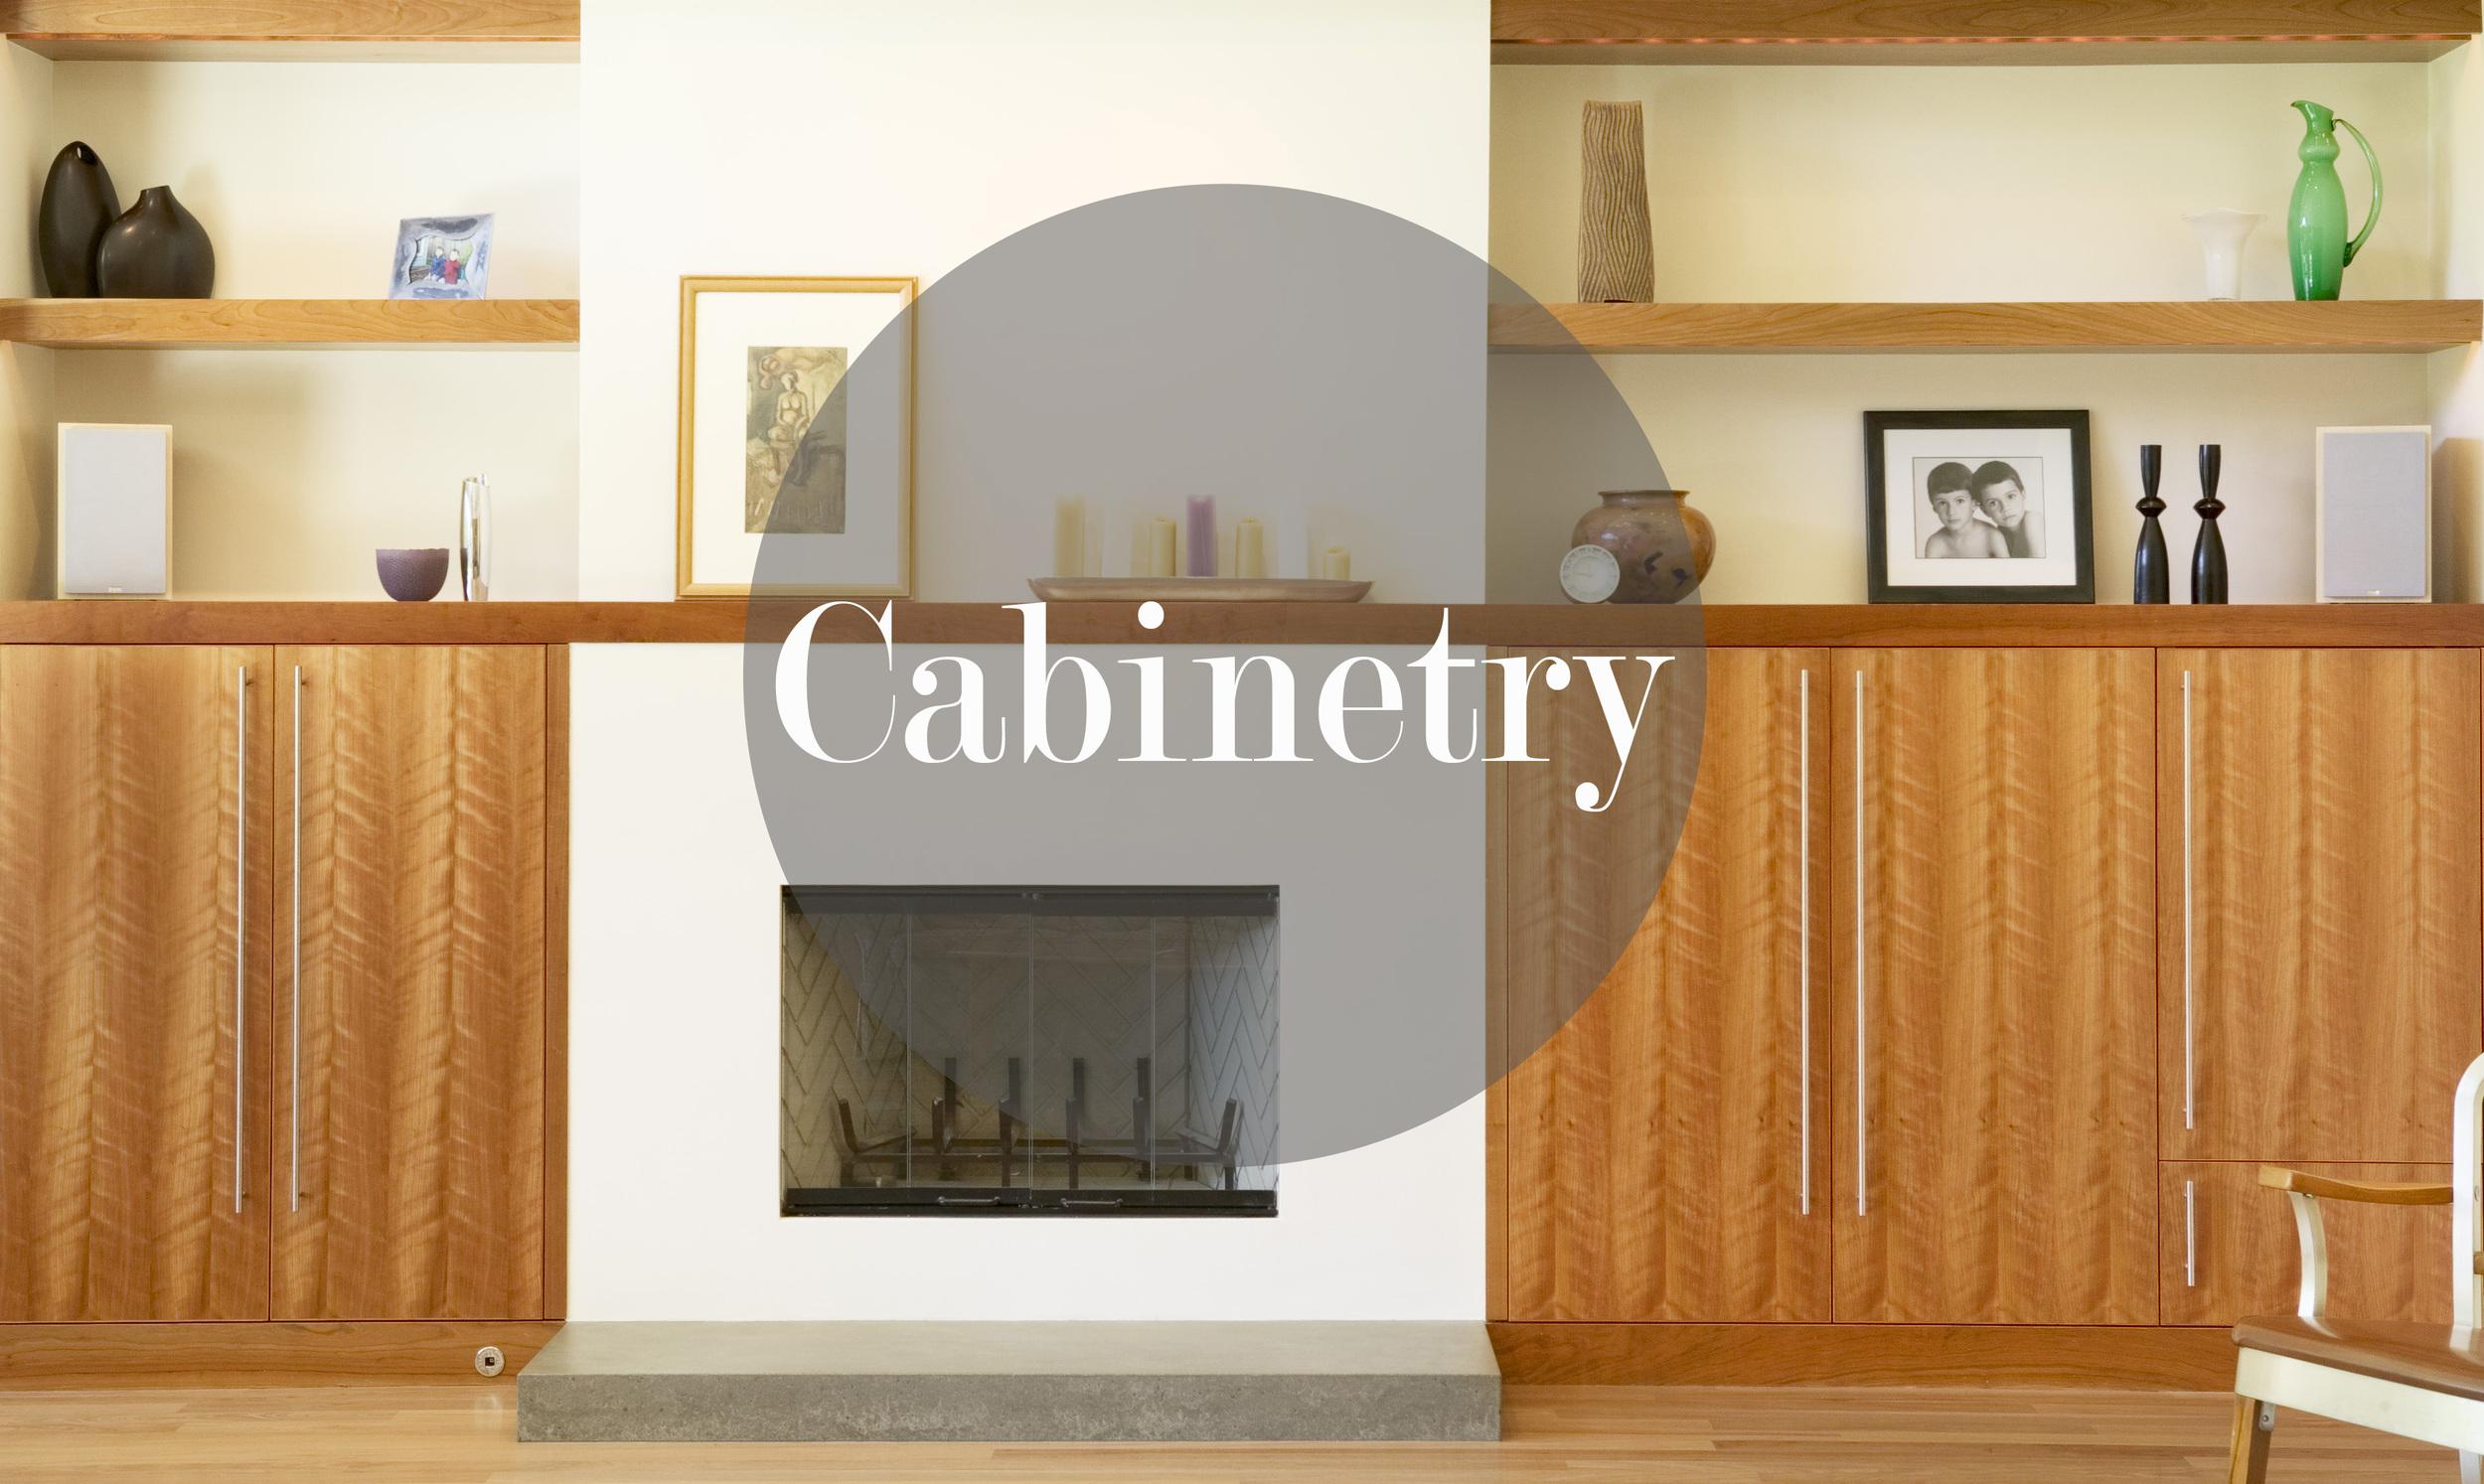 CabinetryOpener.jpg